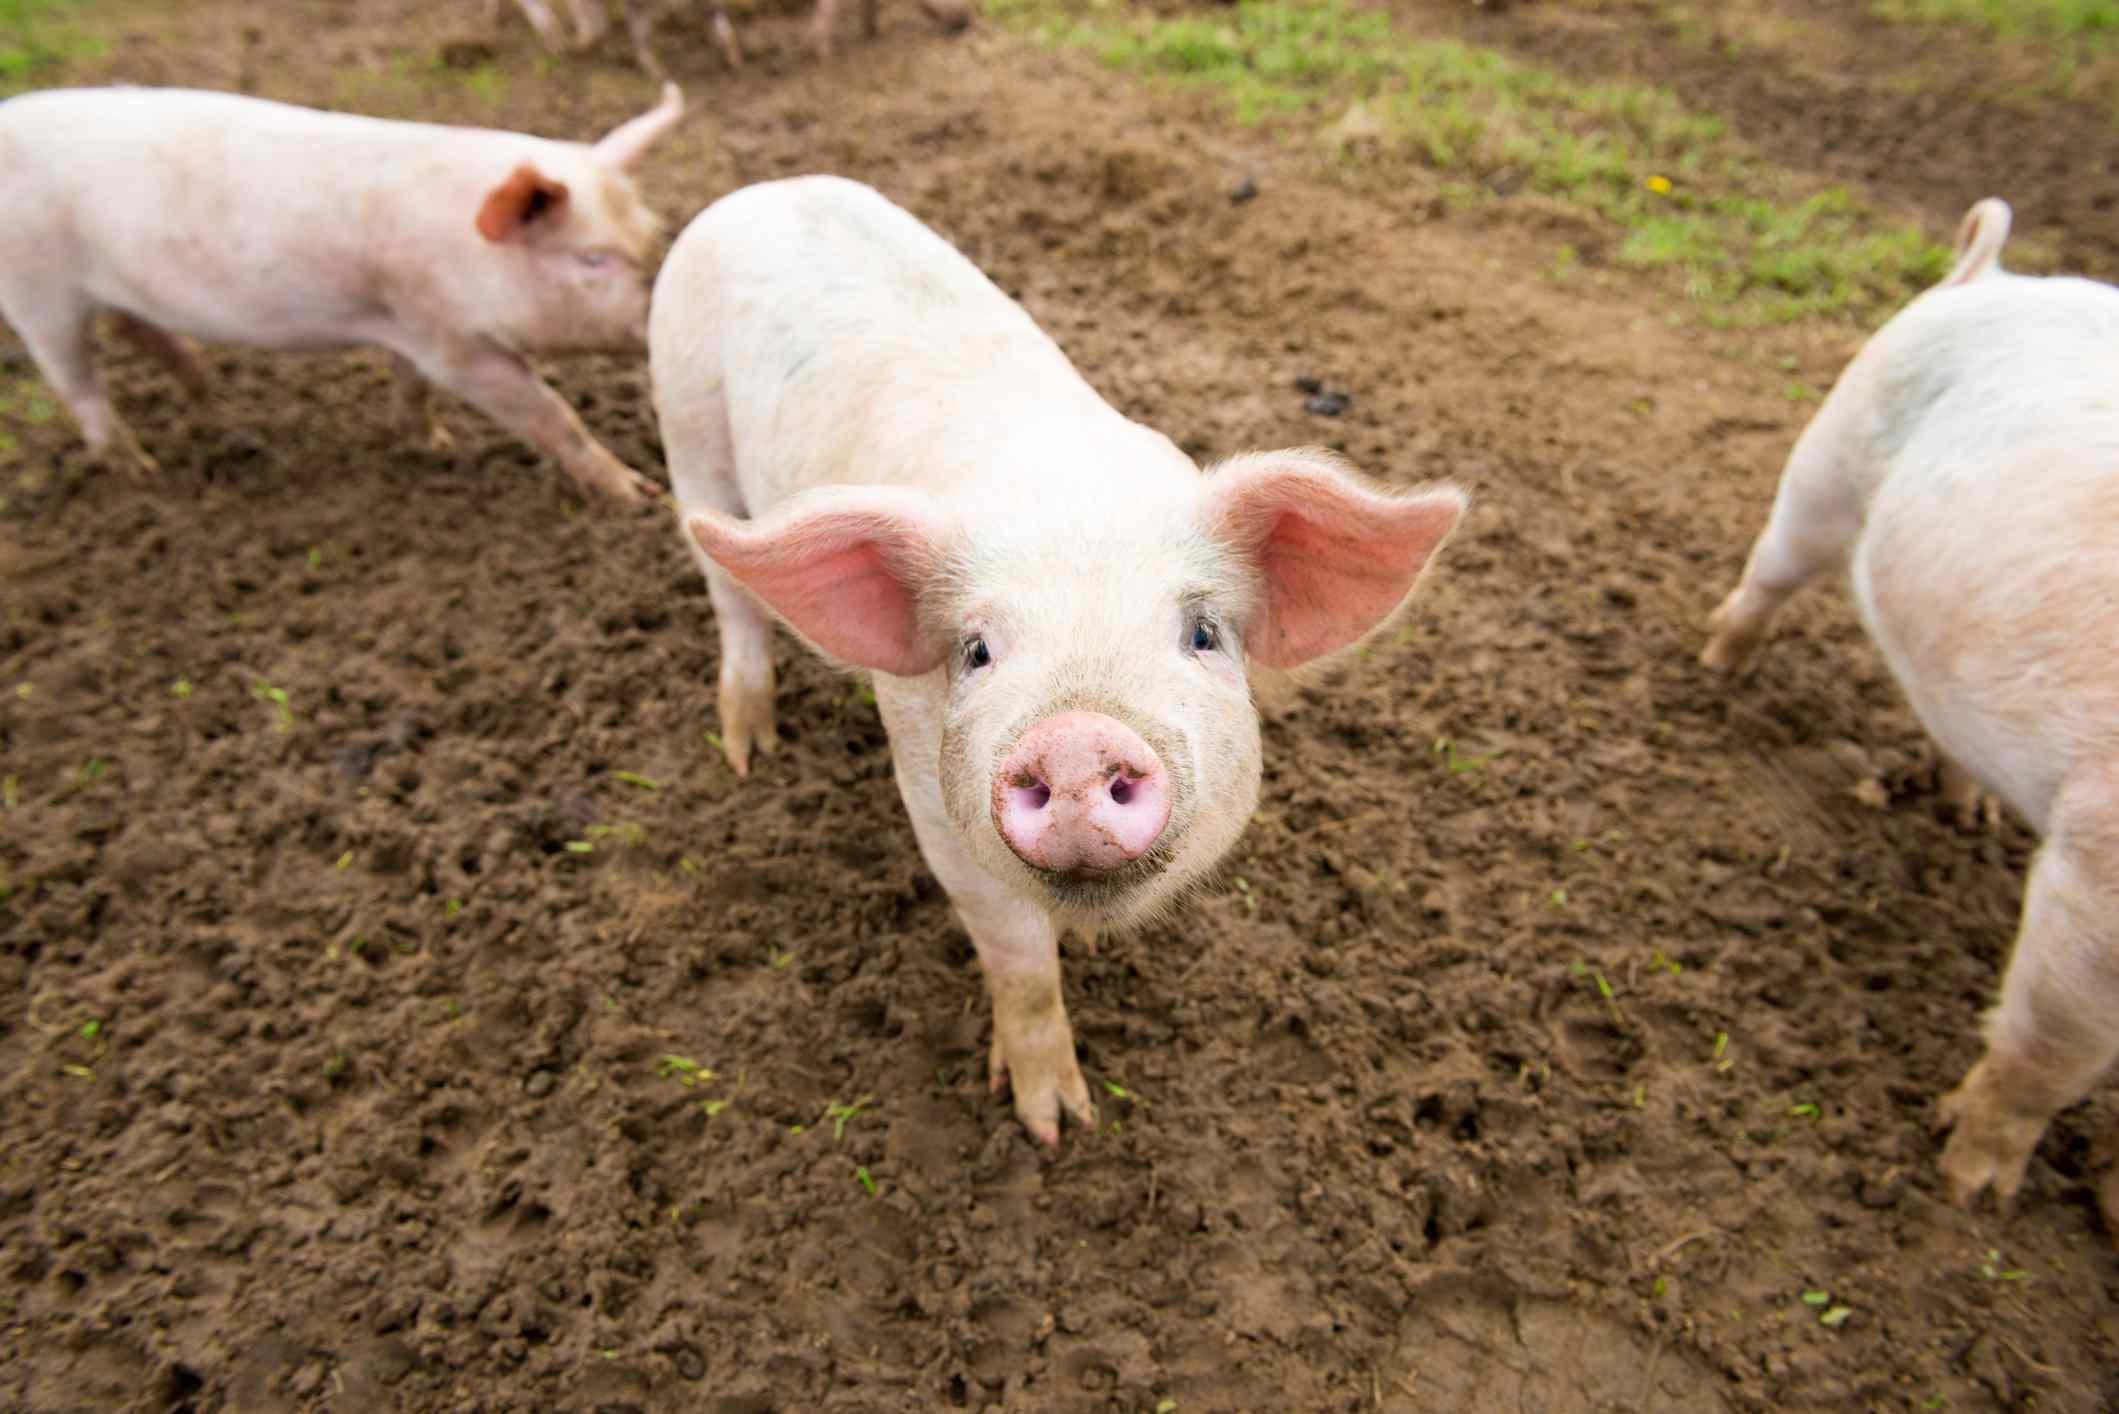 Pigs in Farm